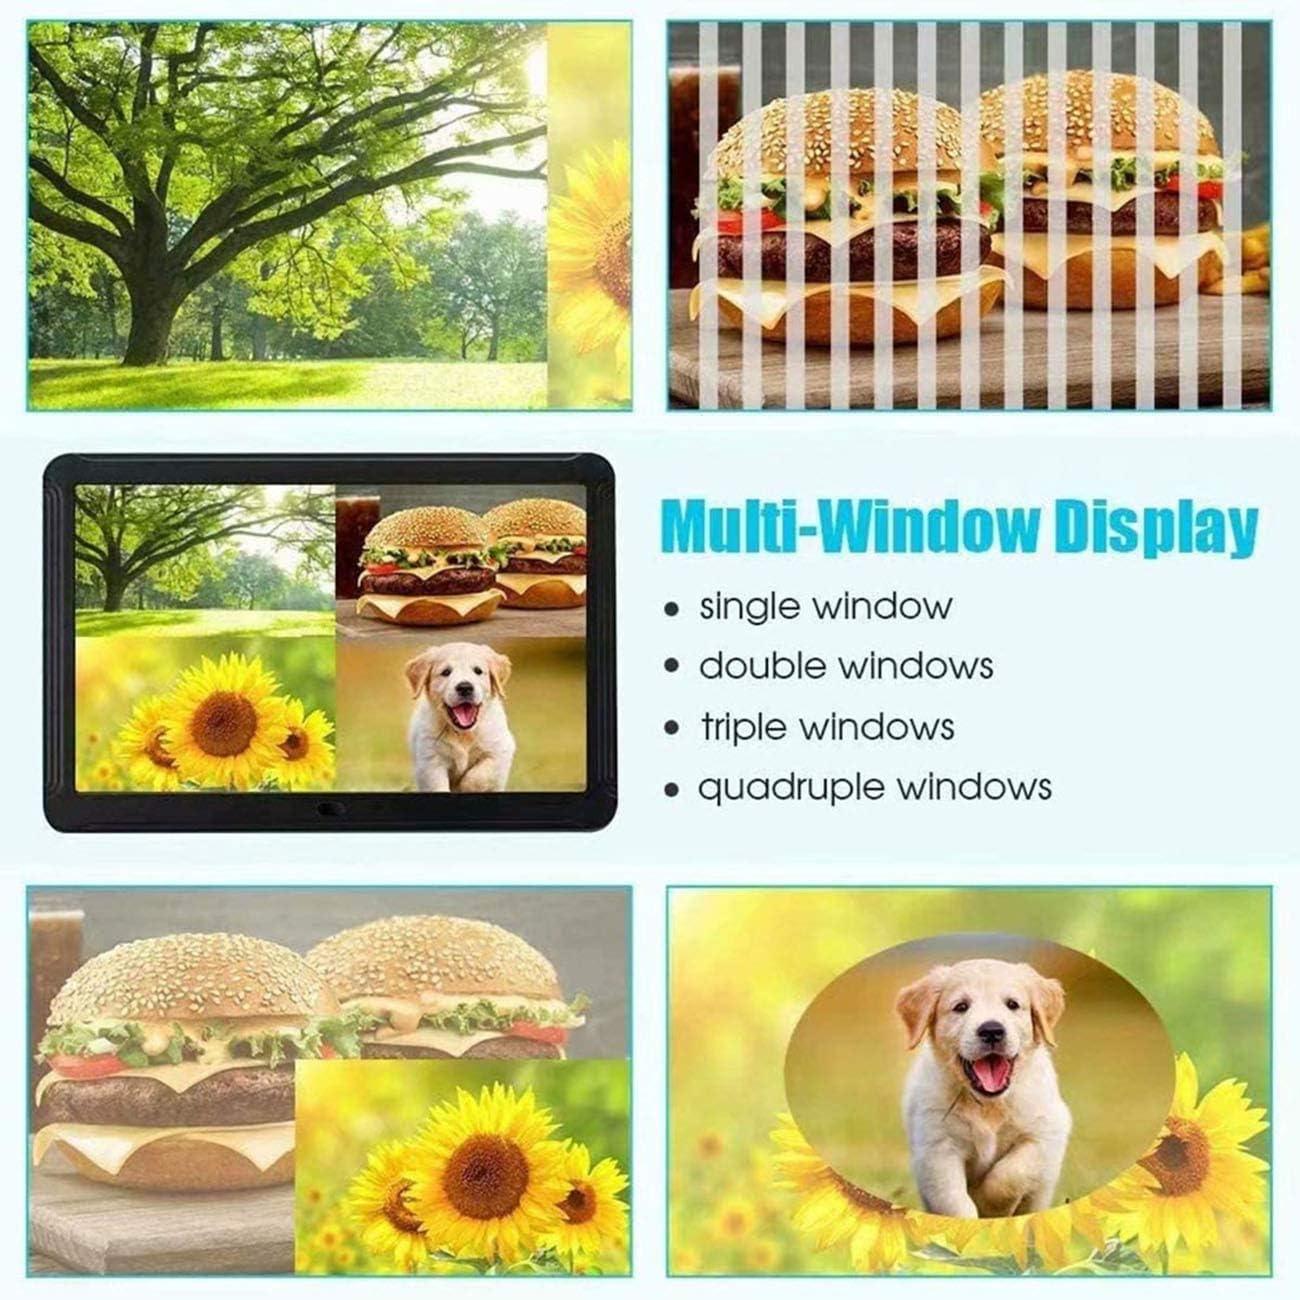 Intelligent Digital Photo Frame with 1920X1080 Ips Screen 8 9 Widescreen Support for Digital Photo Frames with Adjustable Brightness 1080P Video Music Remote 16